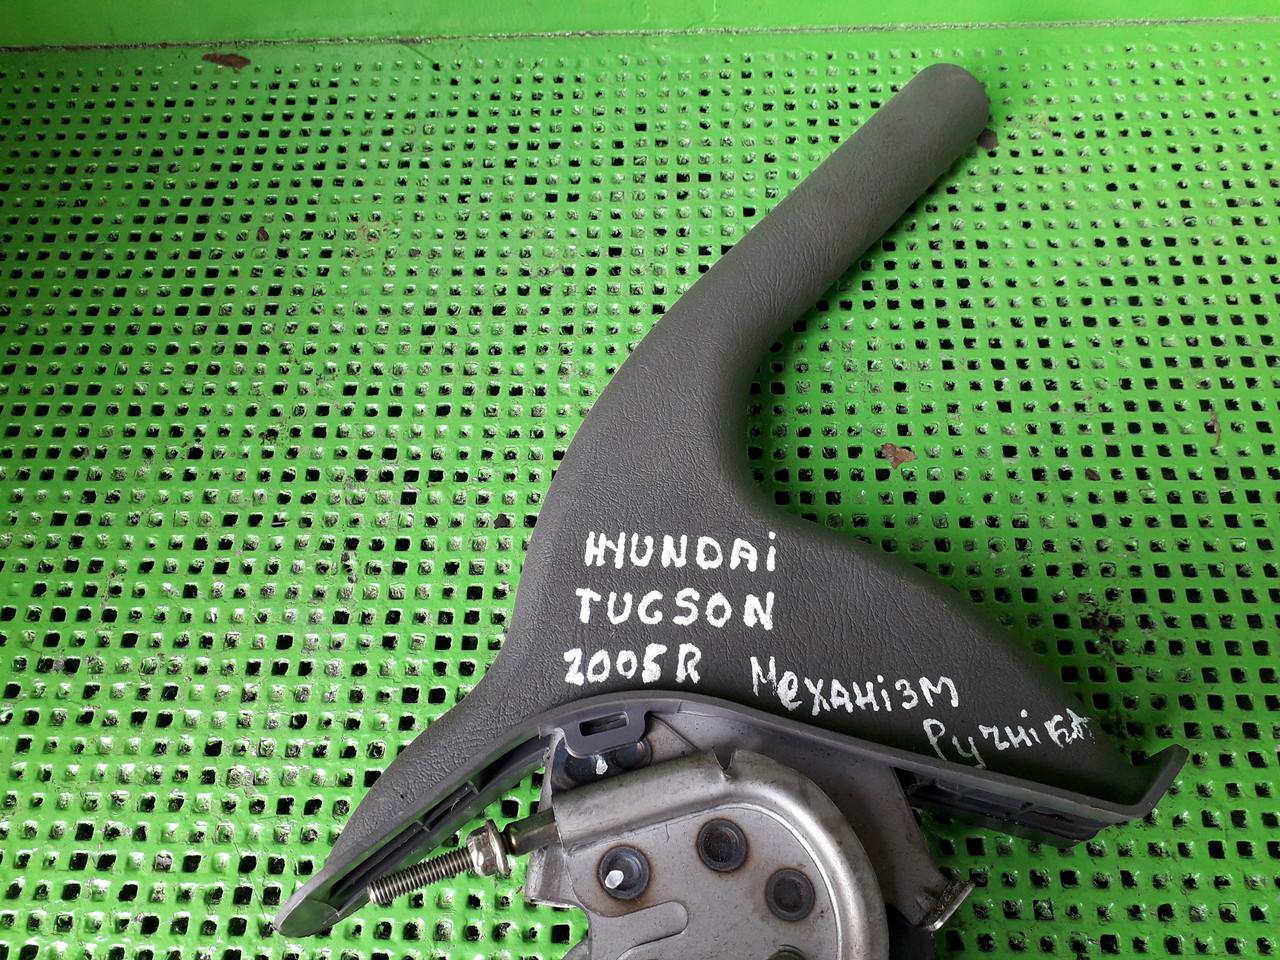 Ручка ручника для Hyundai Tucson 2007